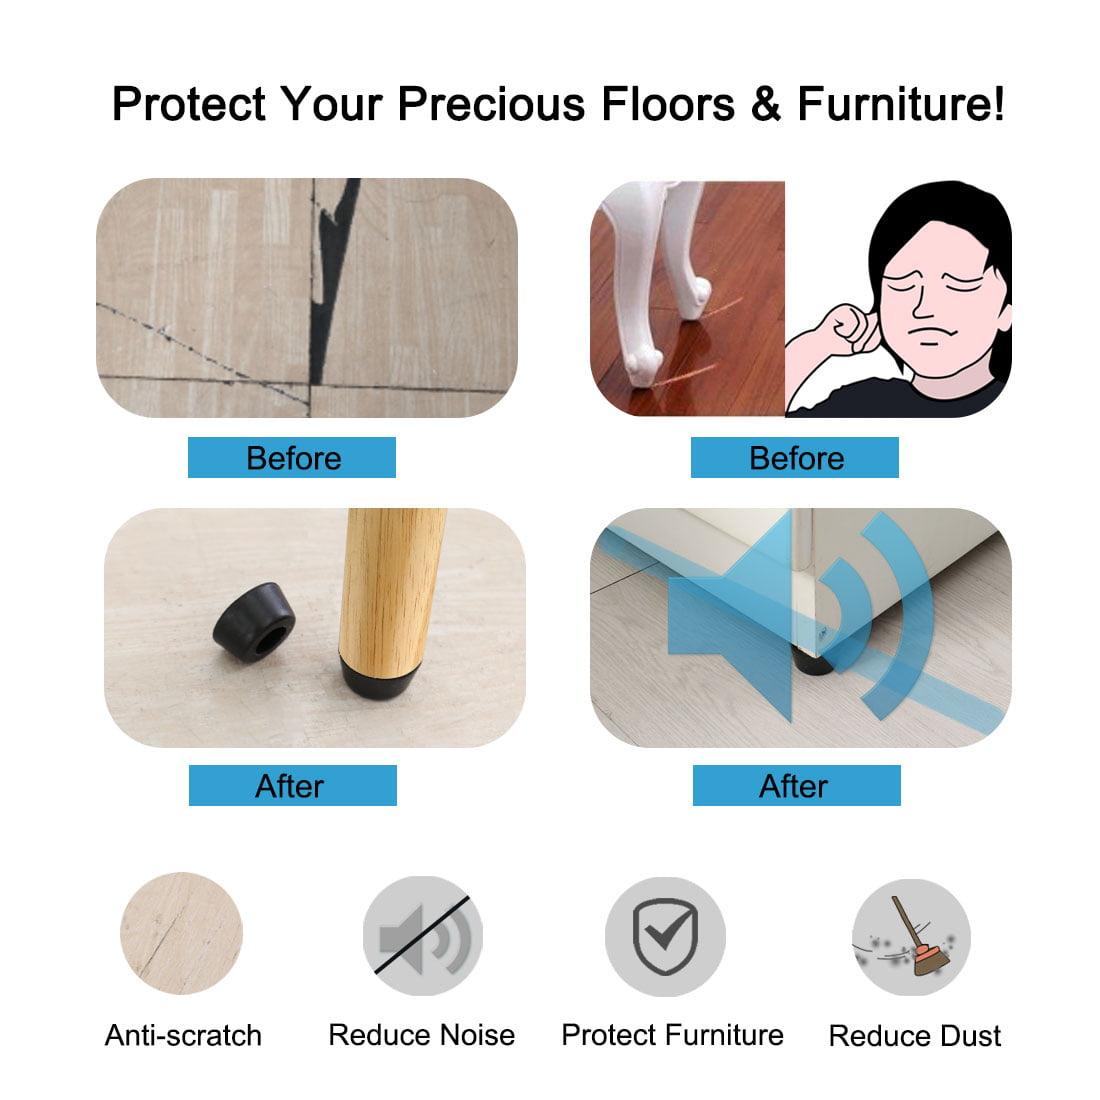 14pcs Rubber Feet Bumper Furniture Table Leg Pads Floor Protector, D35x27x25mm - image 3 of 7